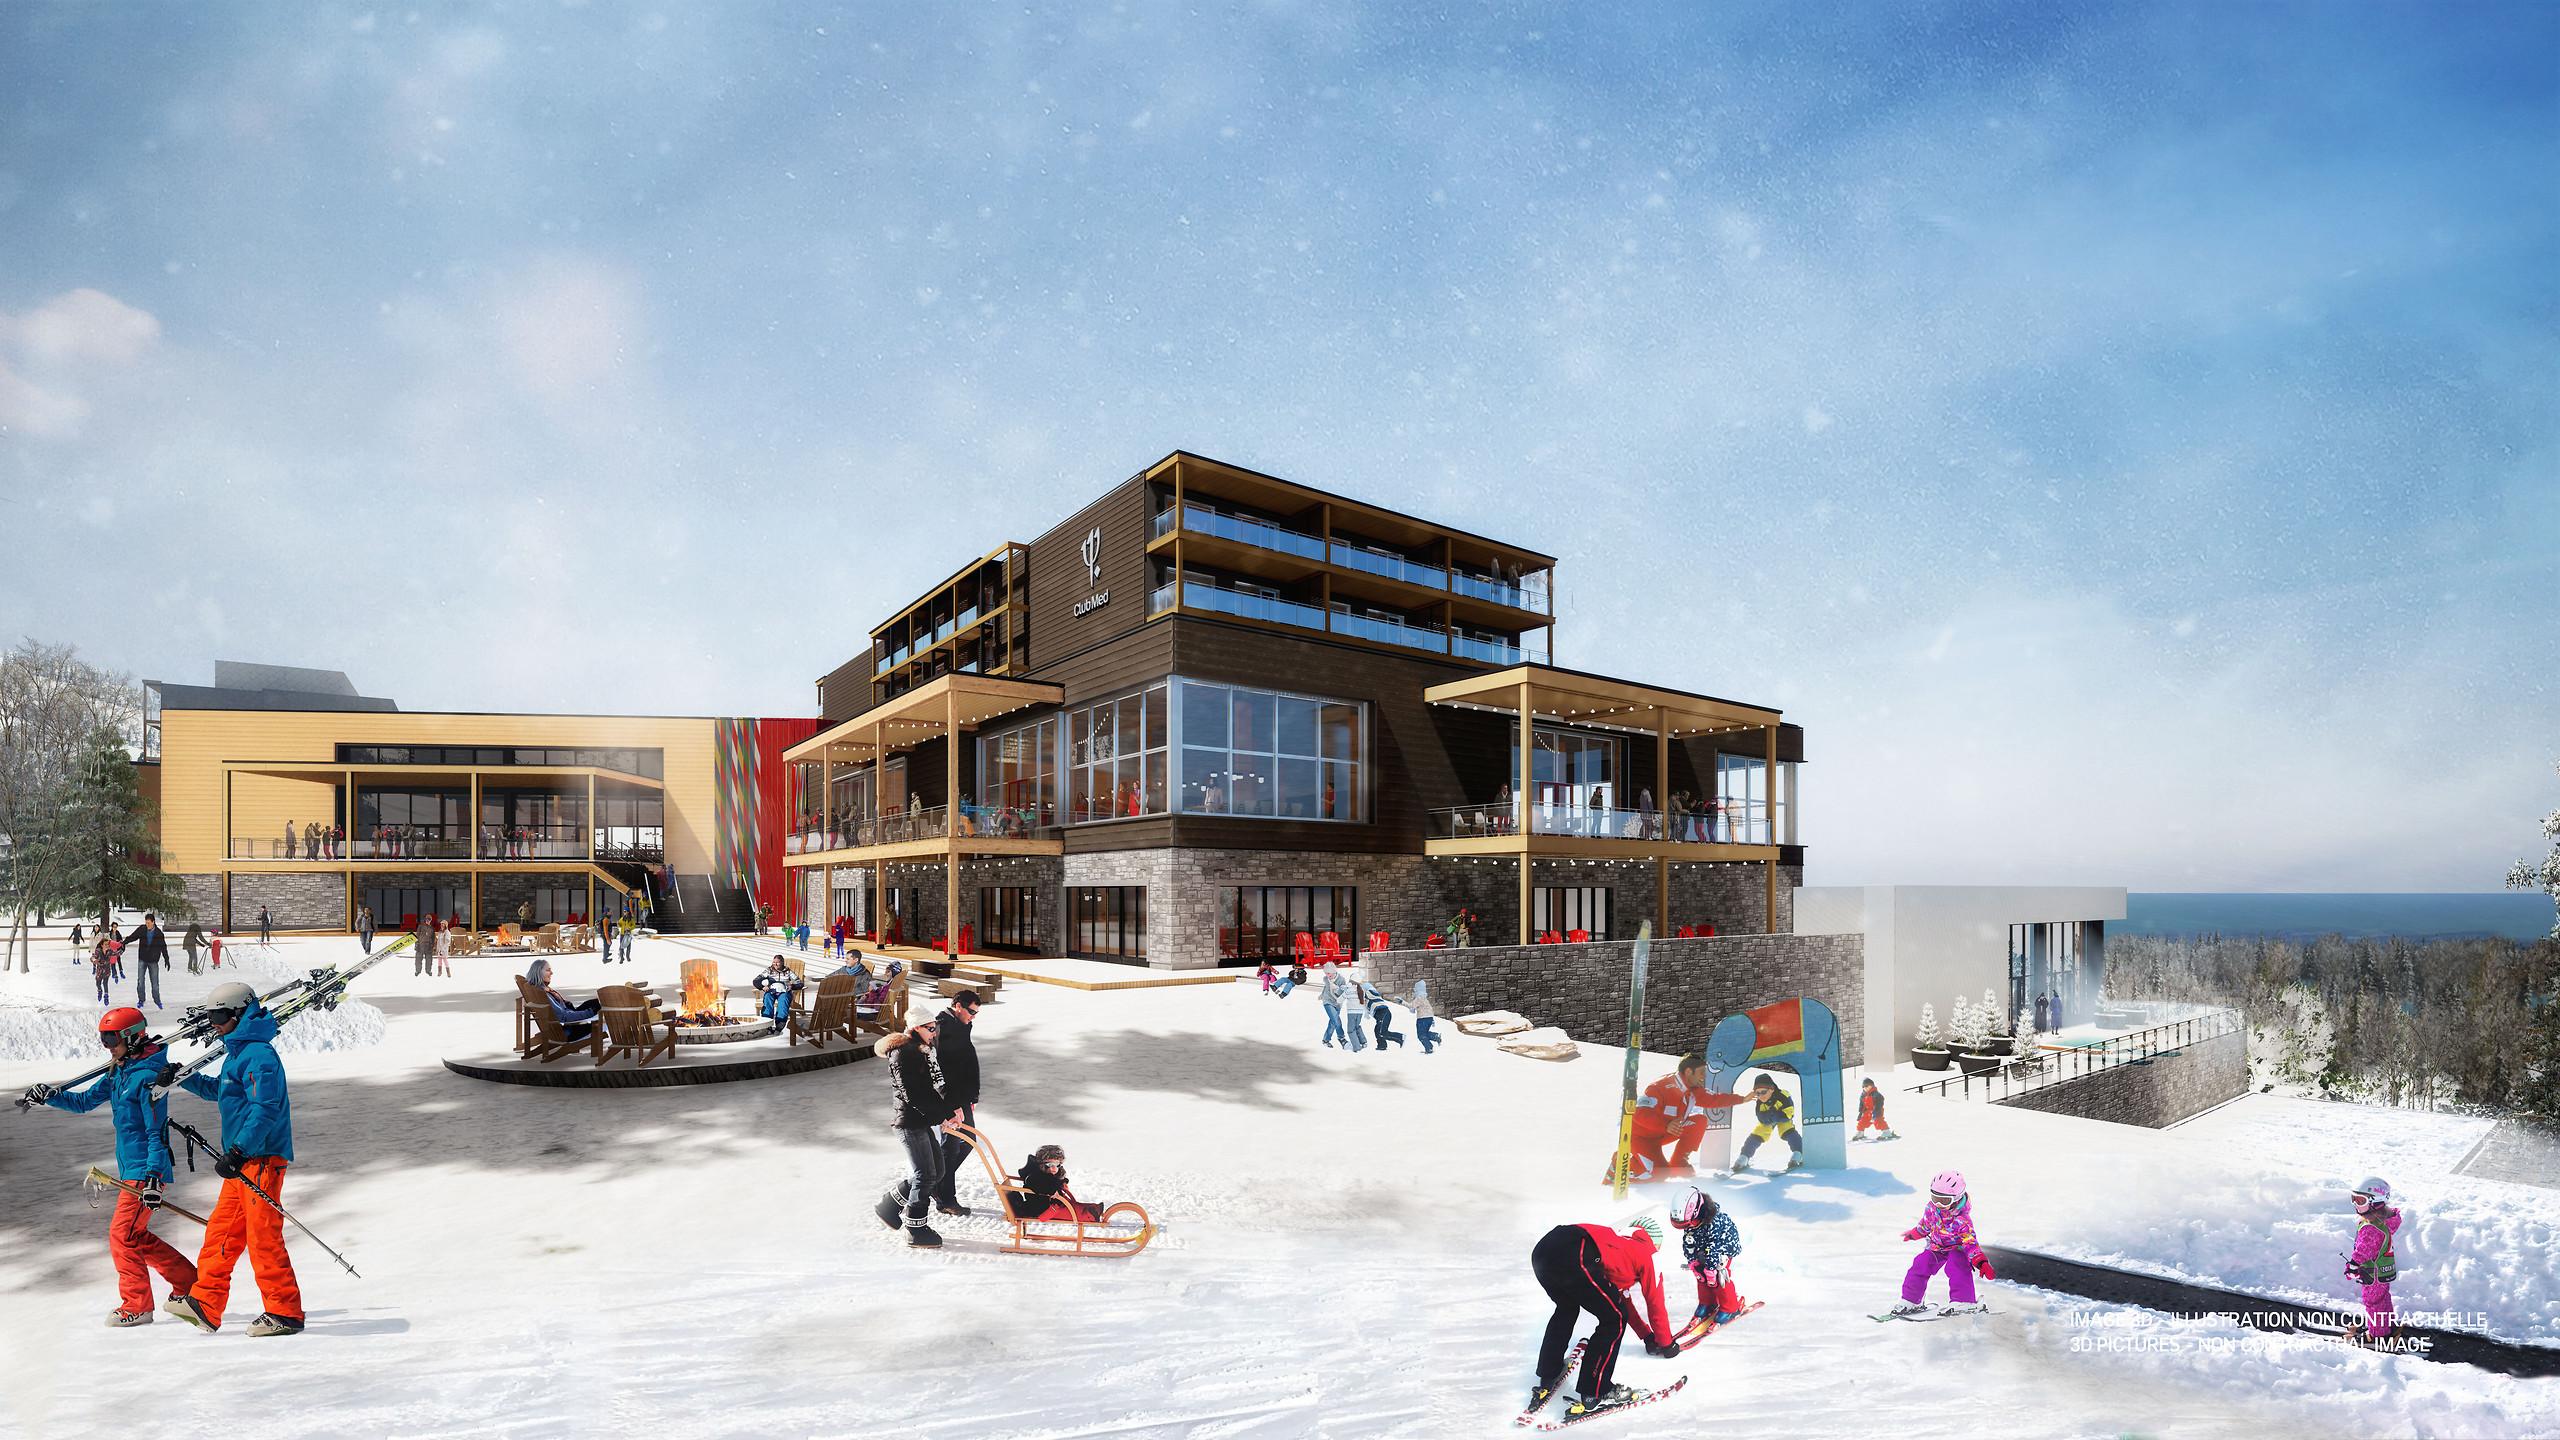 Club Med Québec Charlevoix: plaisir local tout inclus